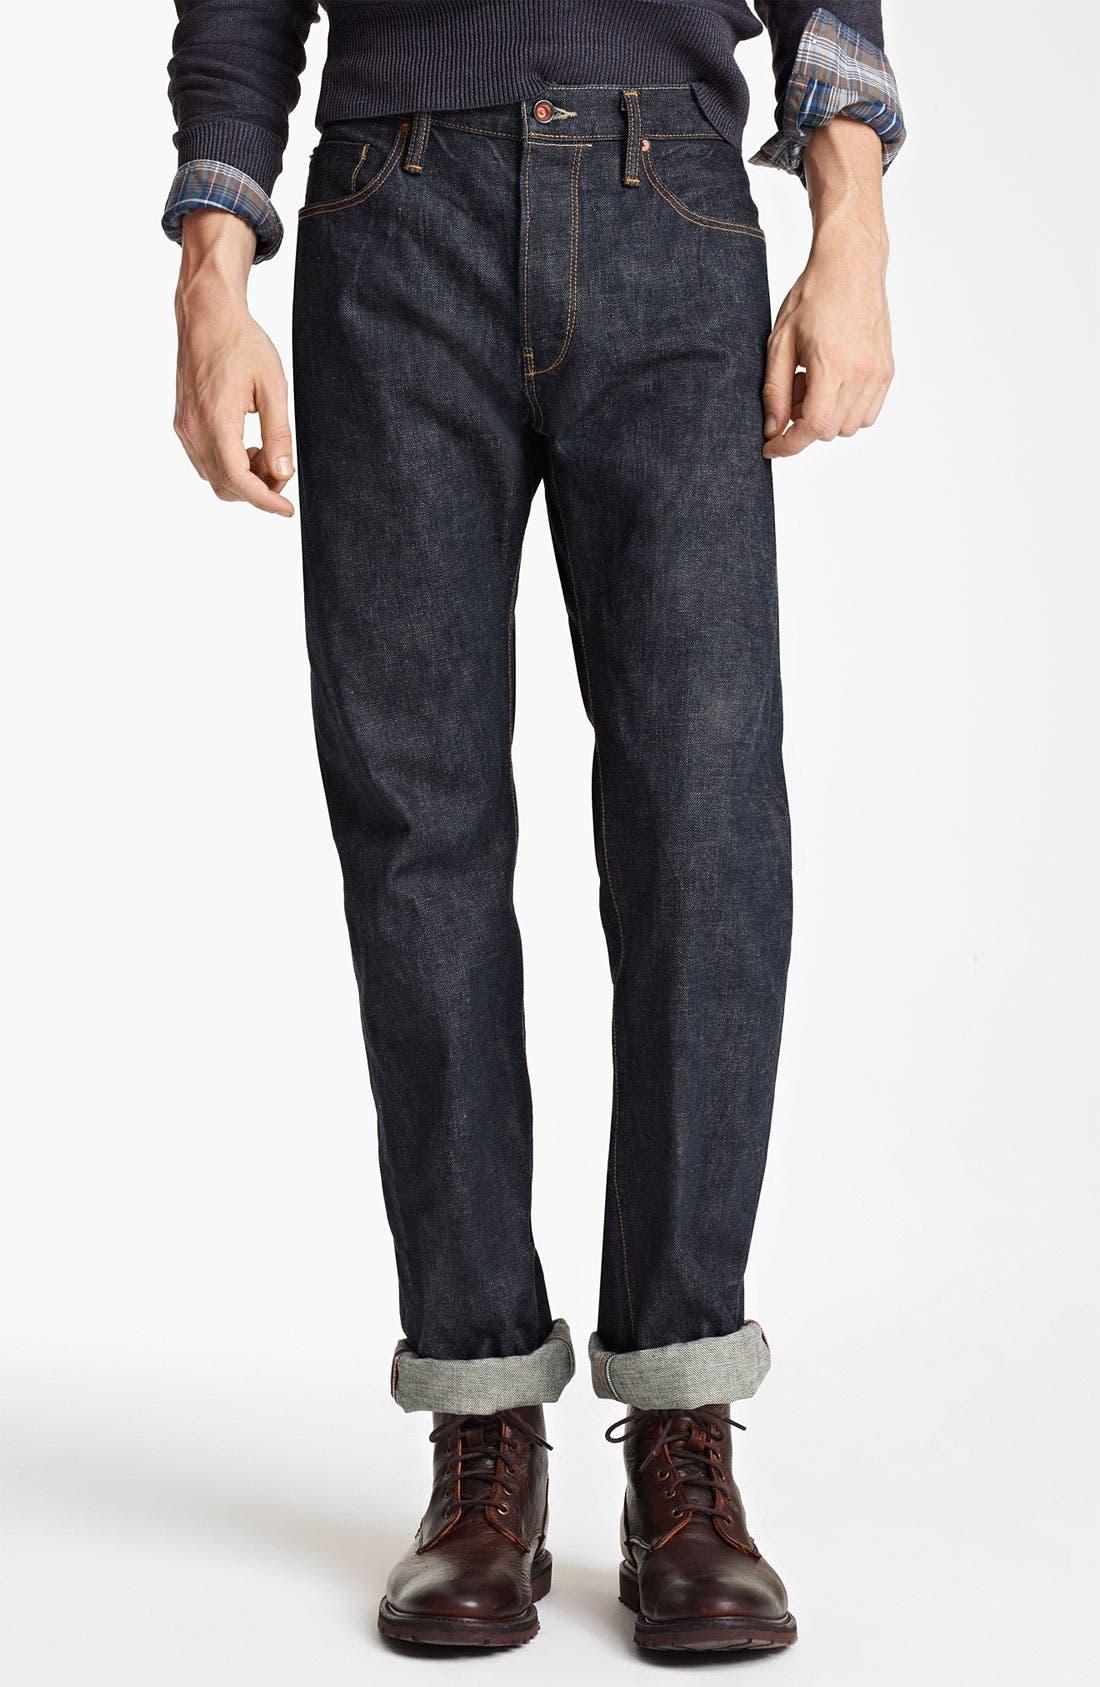 Alternate Image 1 Selected - Todd Snyder Straight Leg Jeans (Indigo)